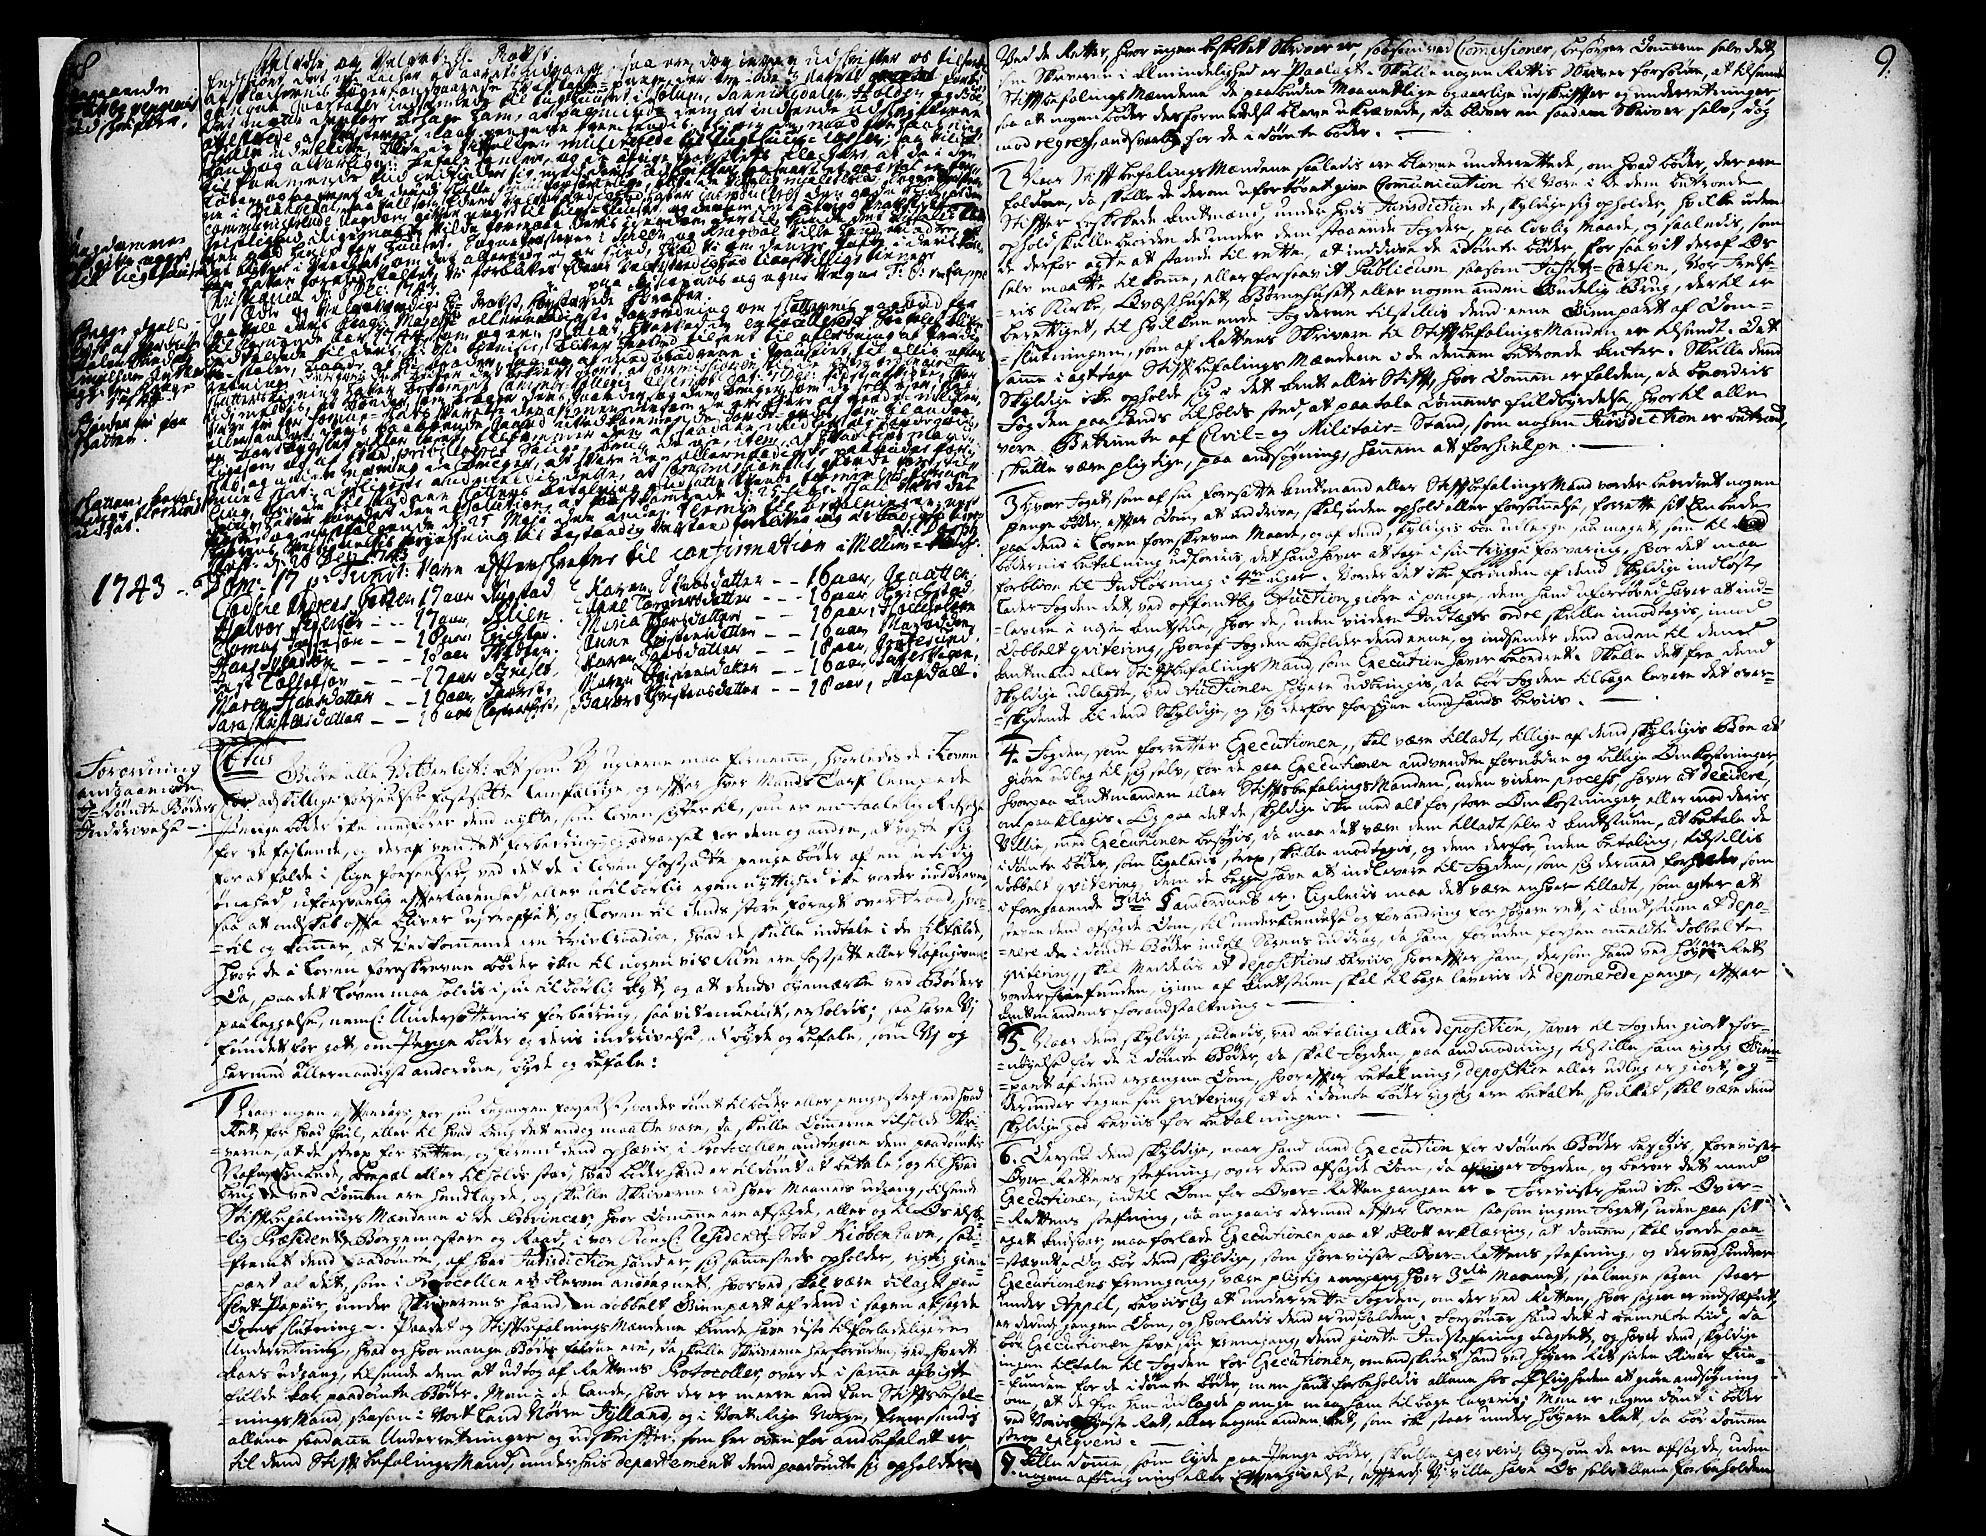 SAKO, Solum sokneprestkontor, A/Aa/L0002: Annen kirkebok nr. 2, 1743-1791, s. 8-9